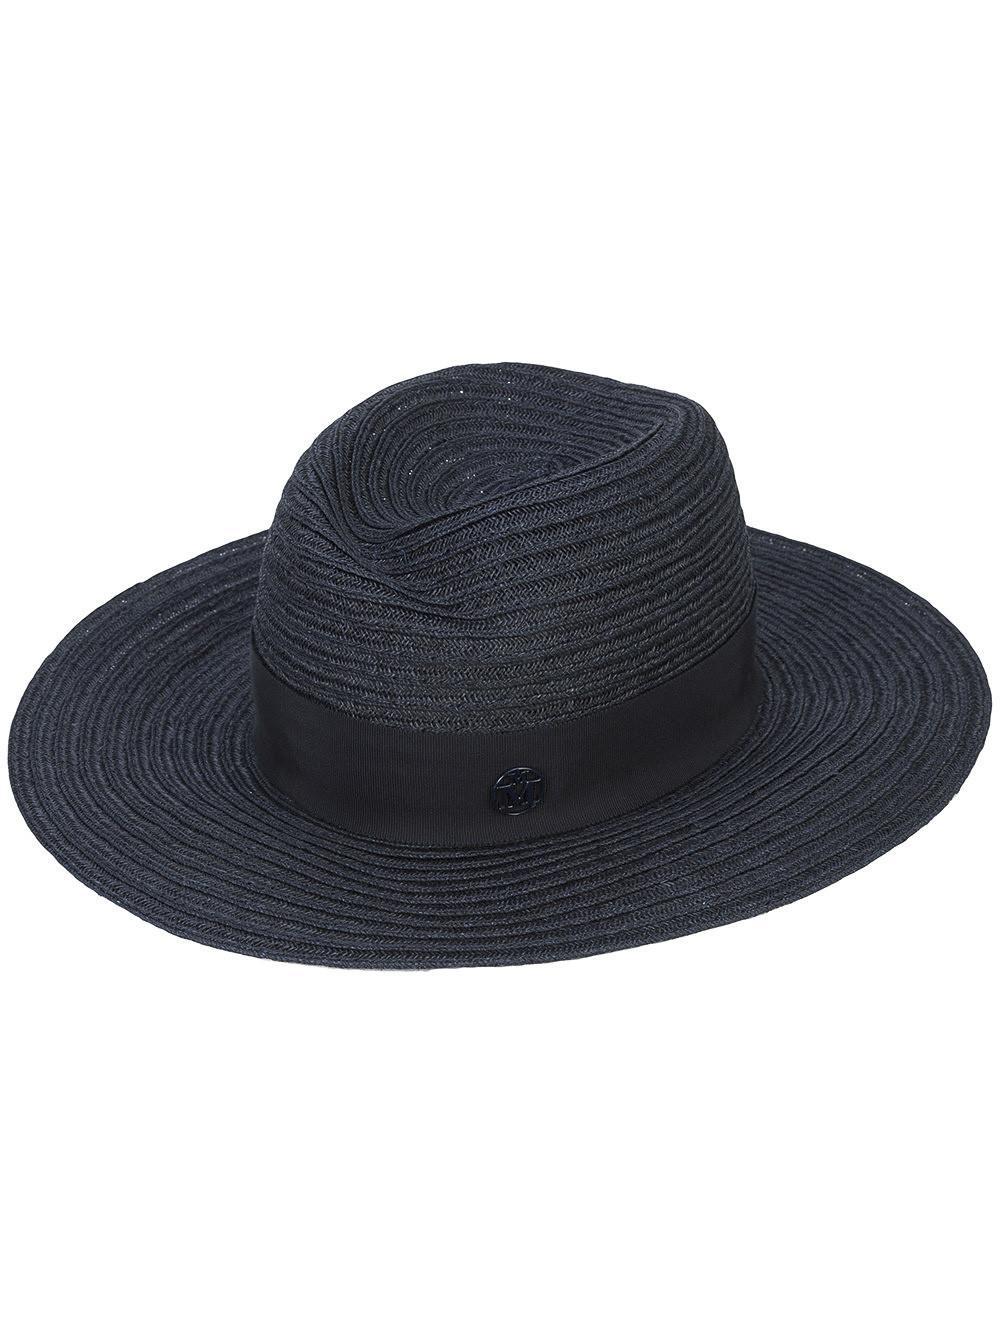 Maison Michel Blue Virginie Panama Hat